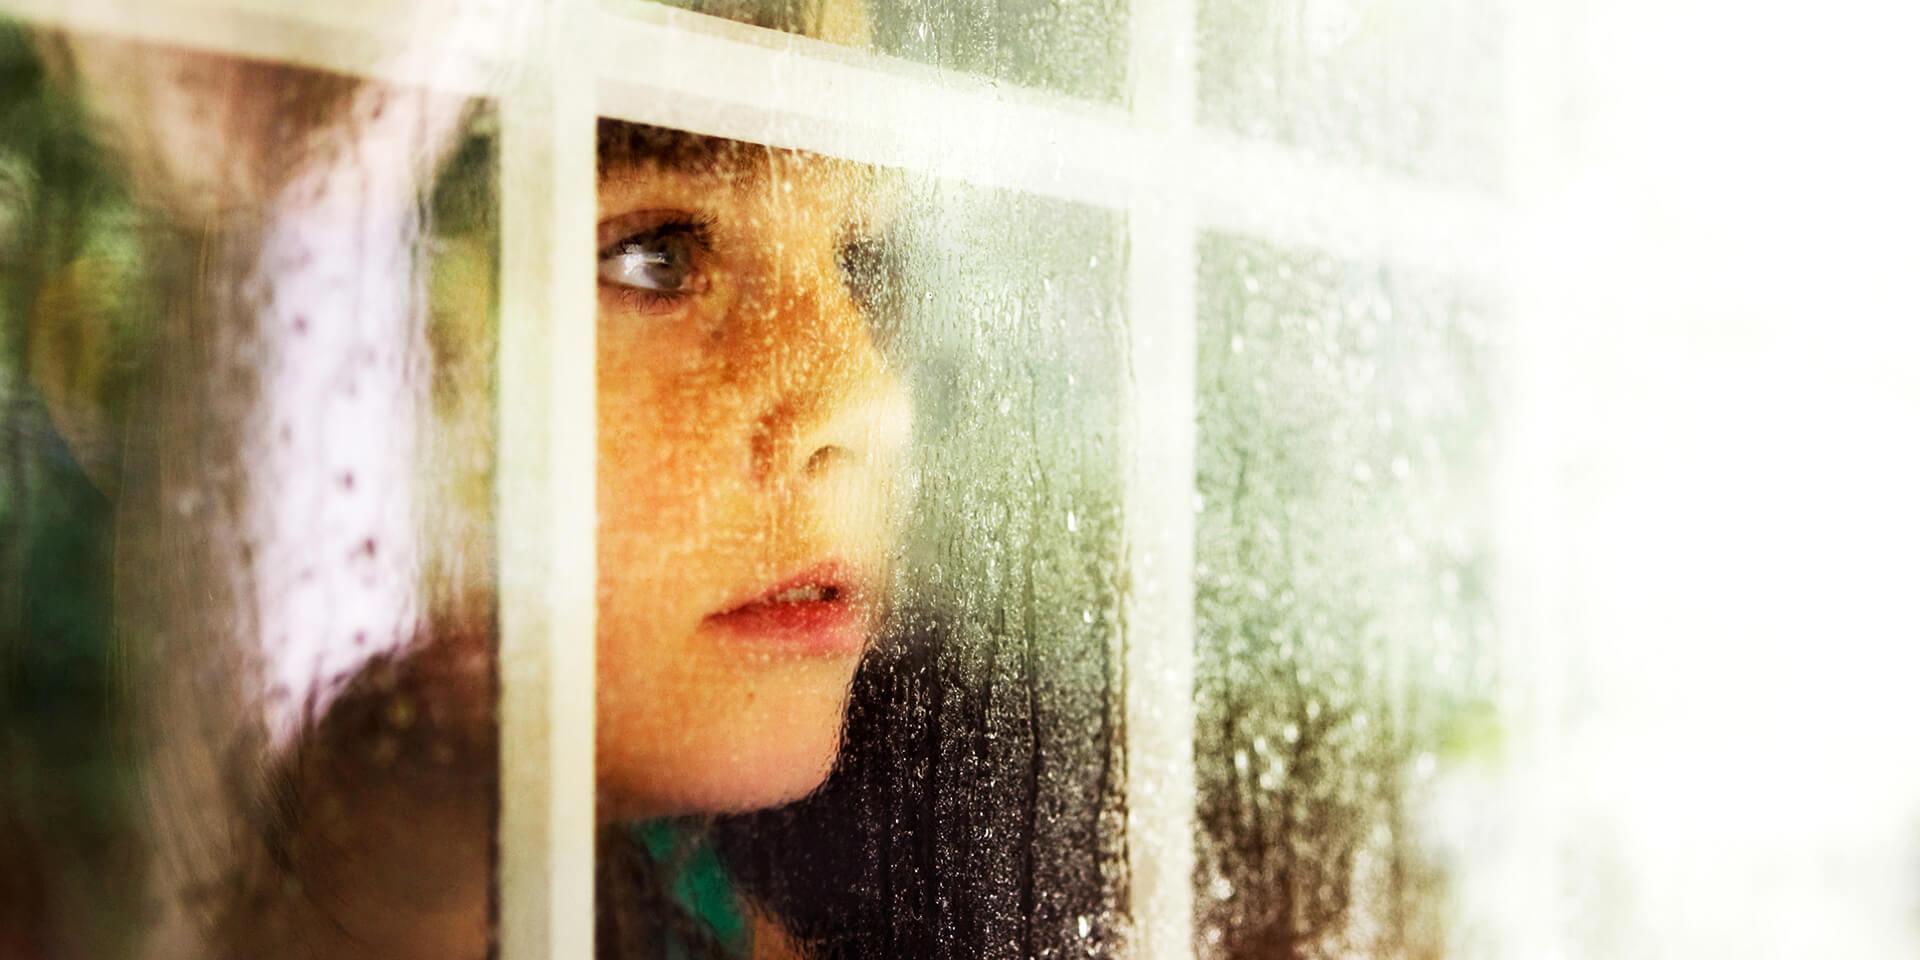 Kind an Fensterscheibe